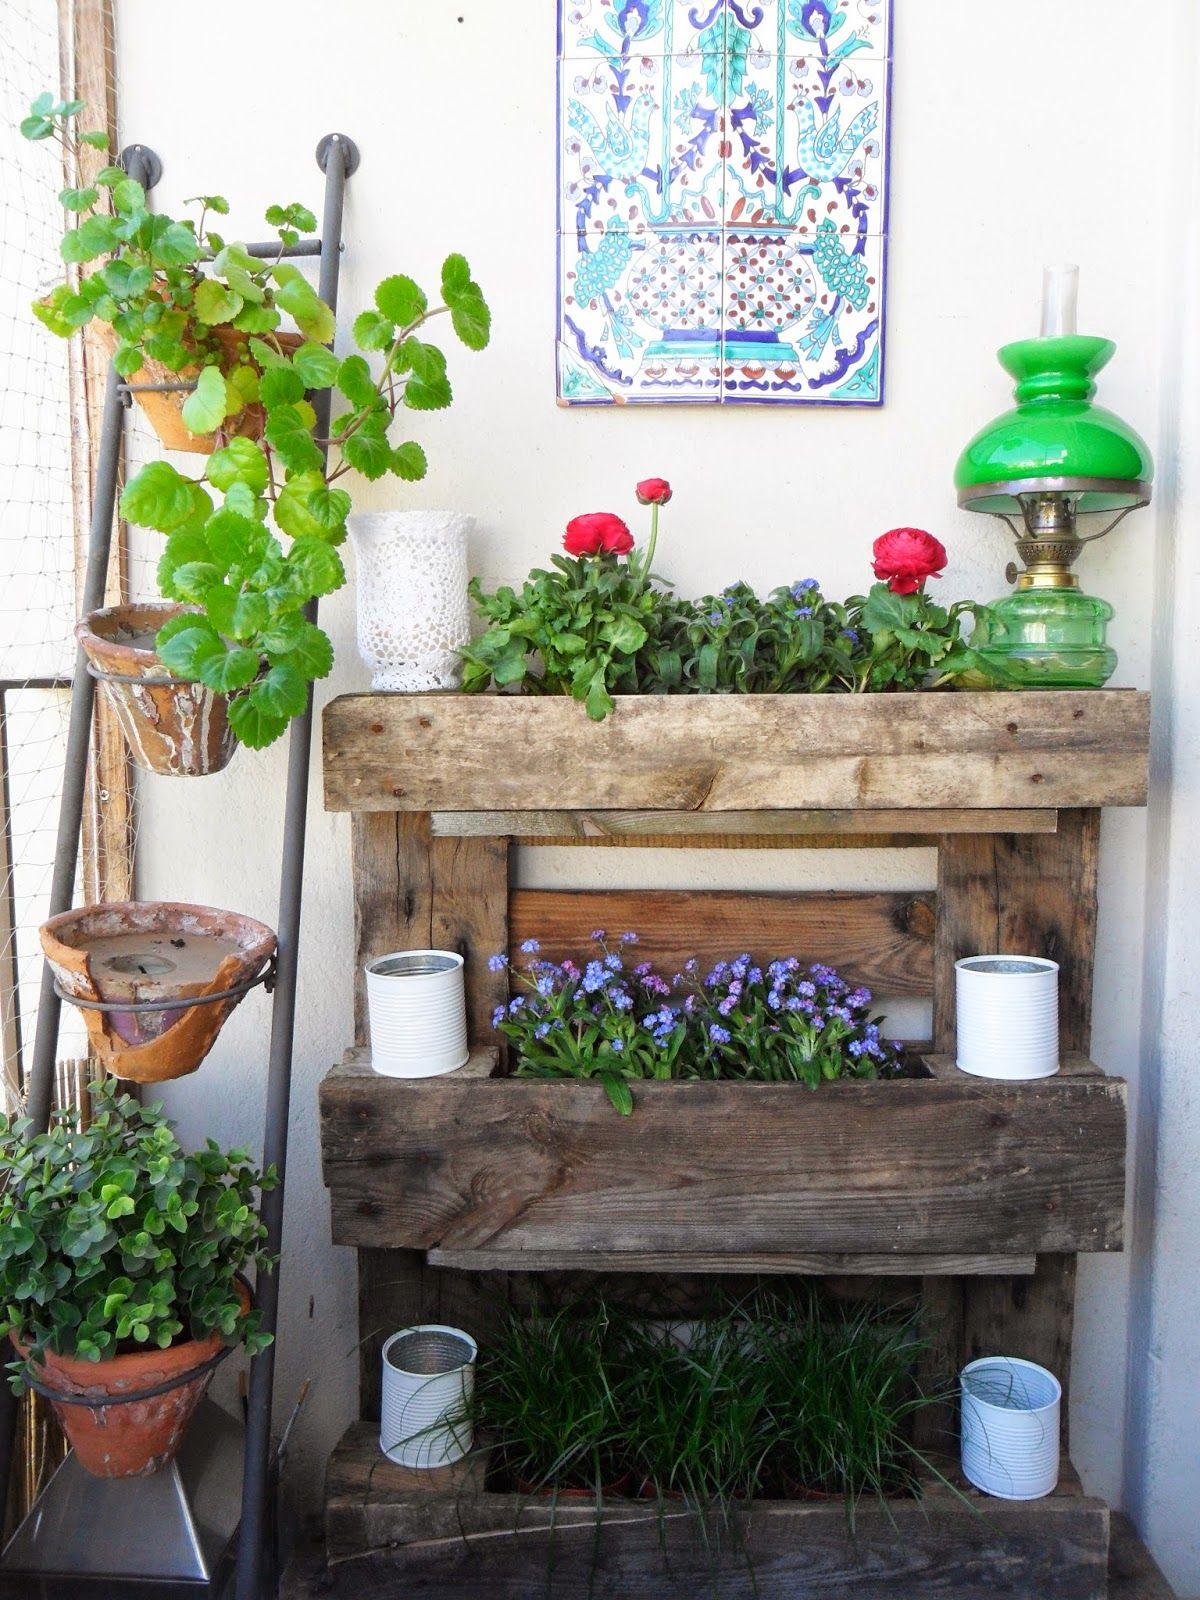 15 Small Garden Ideas To Grow In A Limited Space Wall Garden